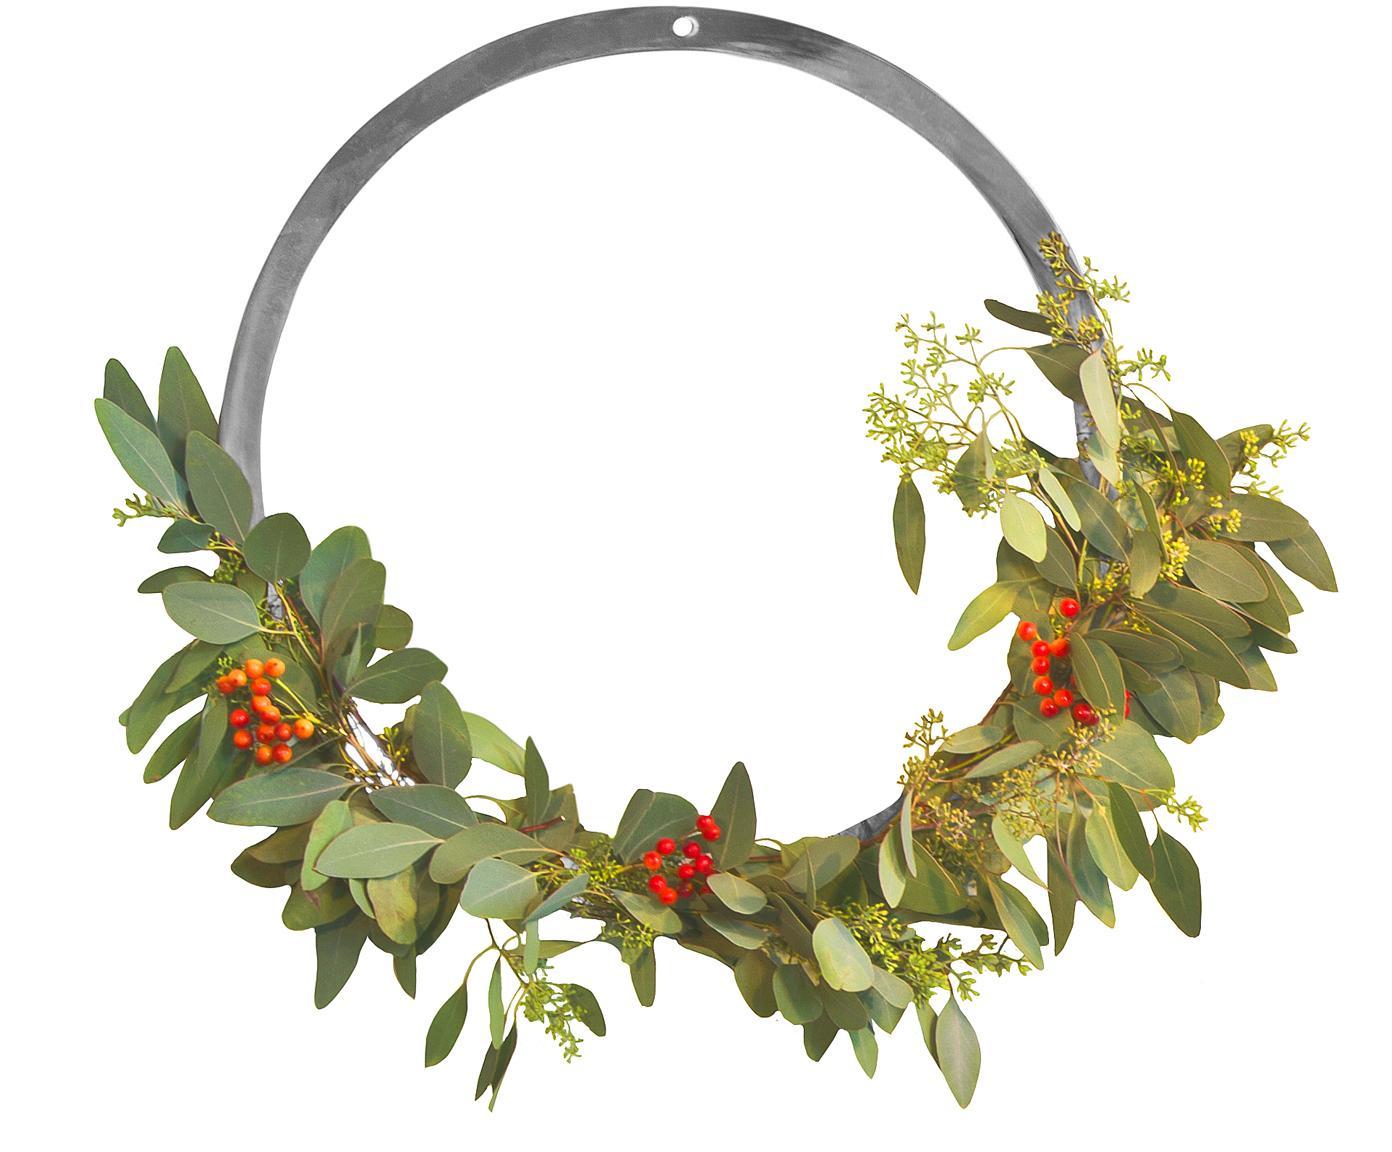 Wandobjekt Wreath, Edelstahl, gebürstet, Edelstahl, Ø 20 cm